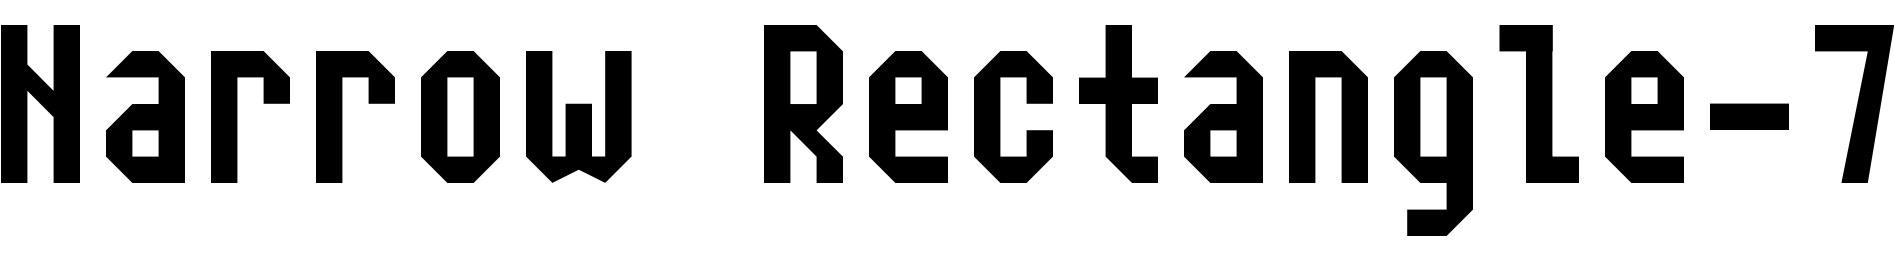 Narrow Rectangle-7